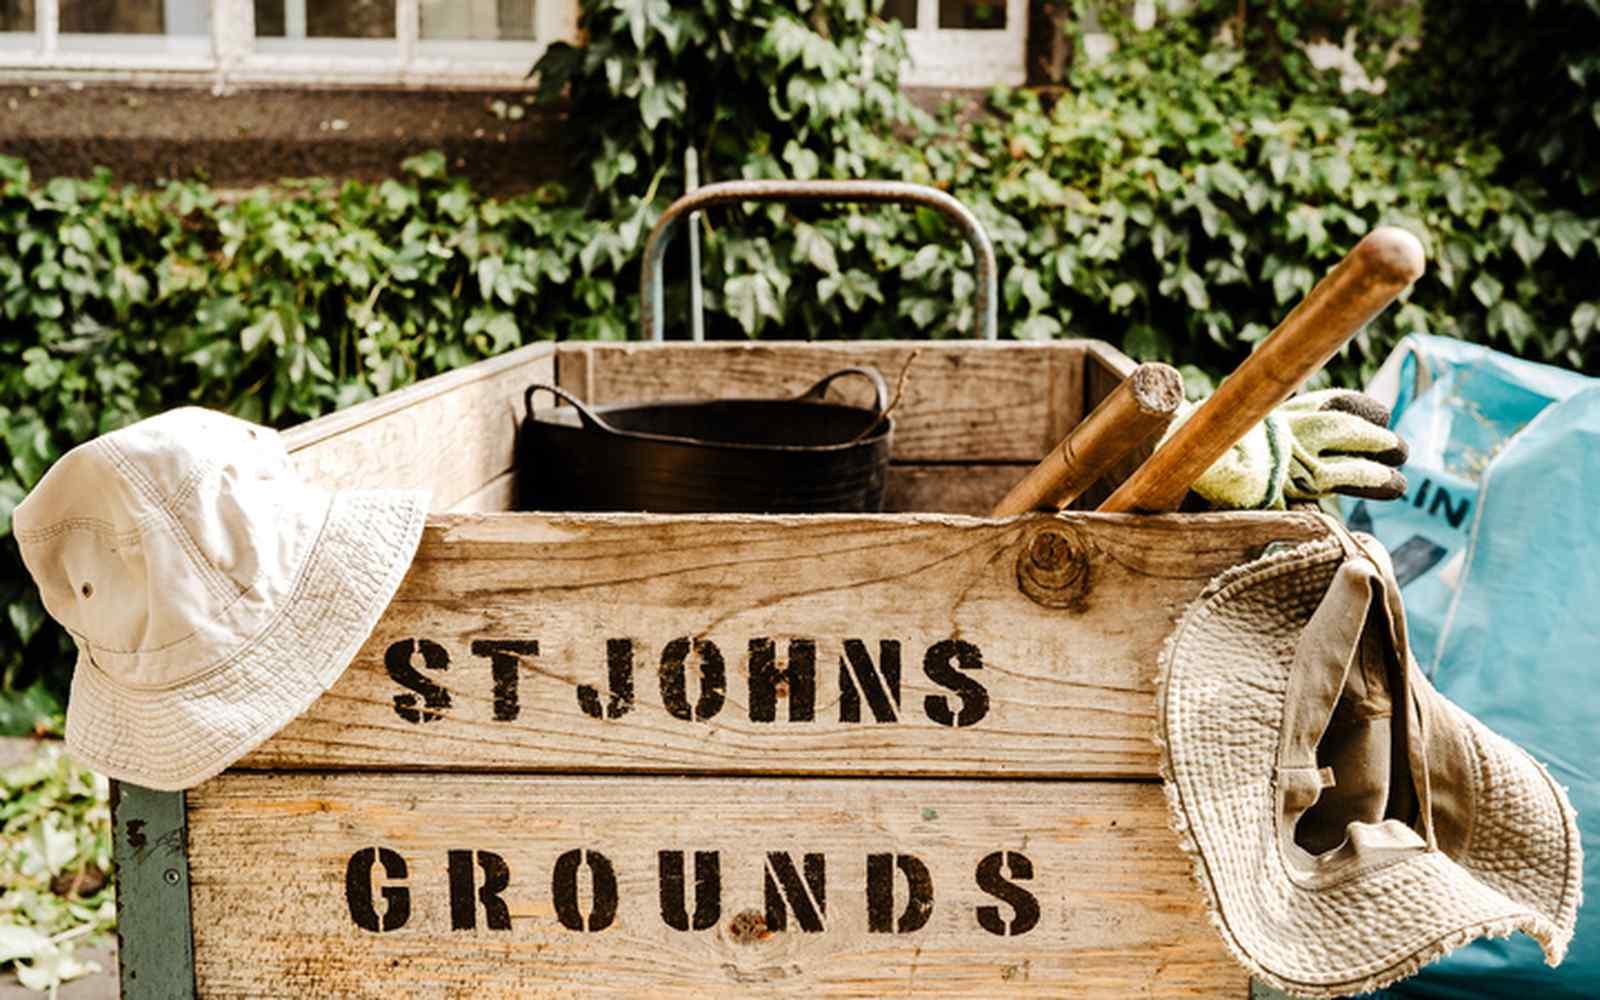 Wooden crate of gardening tools